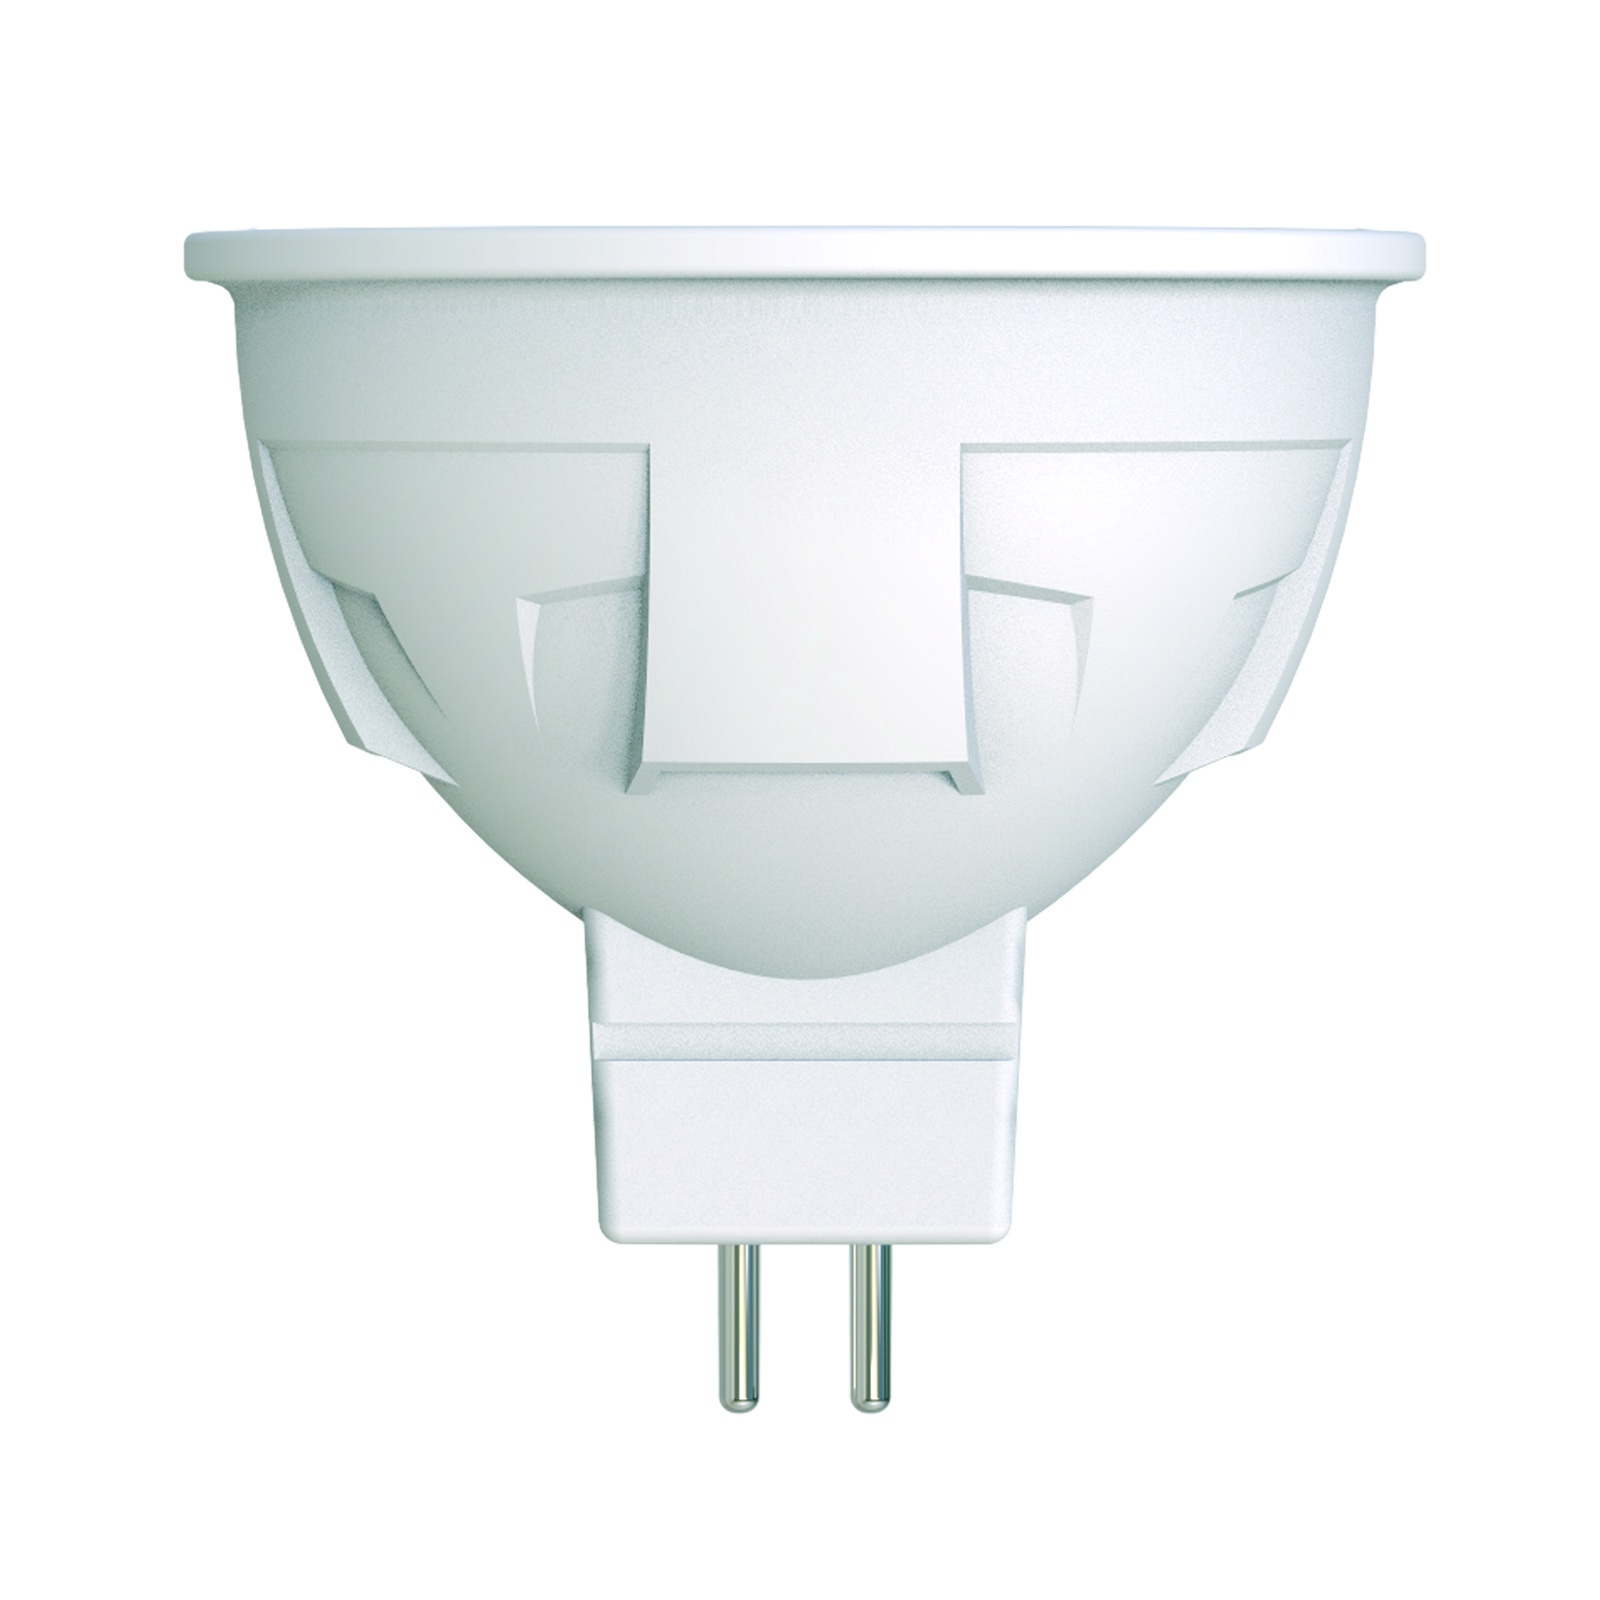 Лампочка Uniel LED-JCDR 6W/WW/GU5.3/FR/DIM 3000K, Теплый свет 6 Вт, Светодиодная